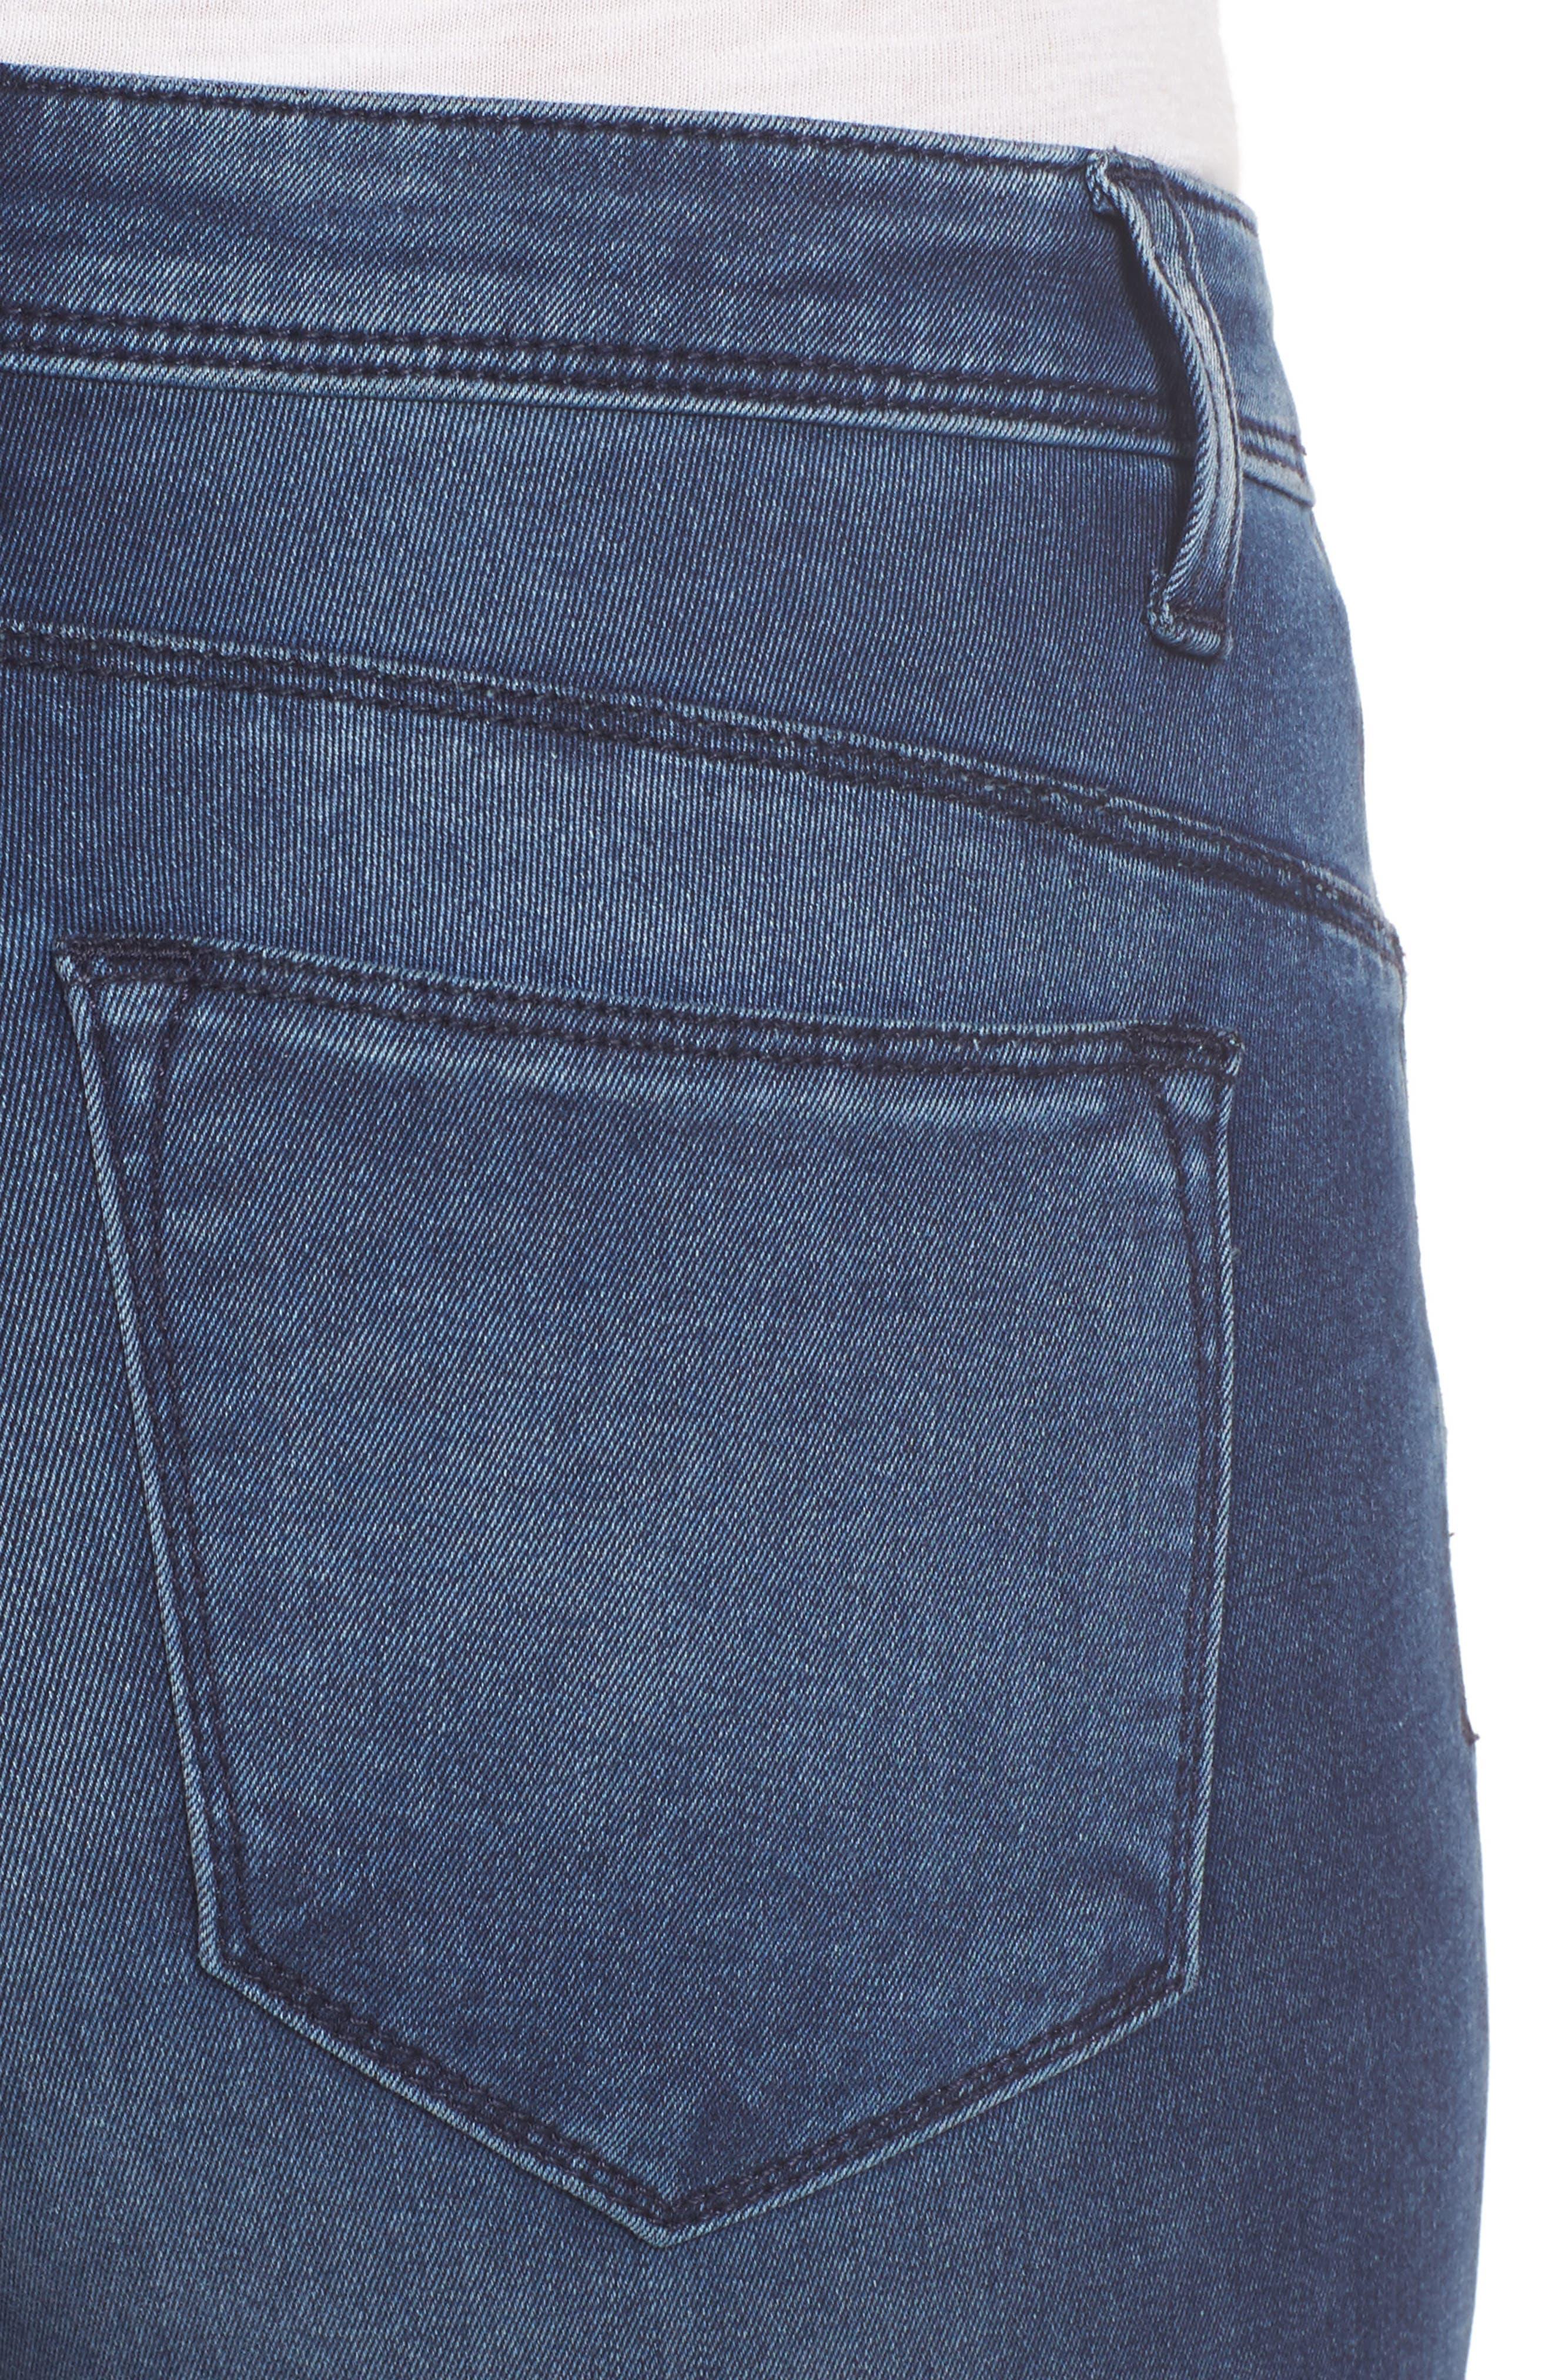 Jennifer Ultra Skinny Jeans,                             Alternate thumbnail 4, color,                             420